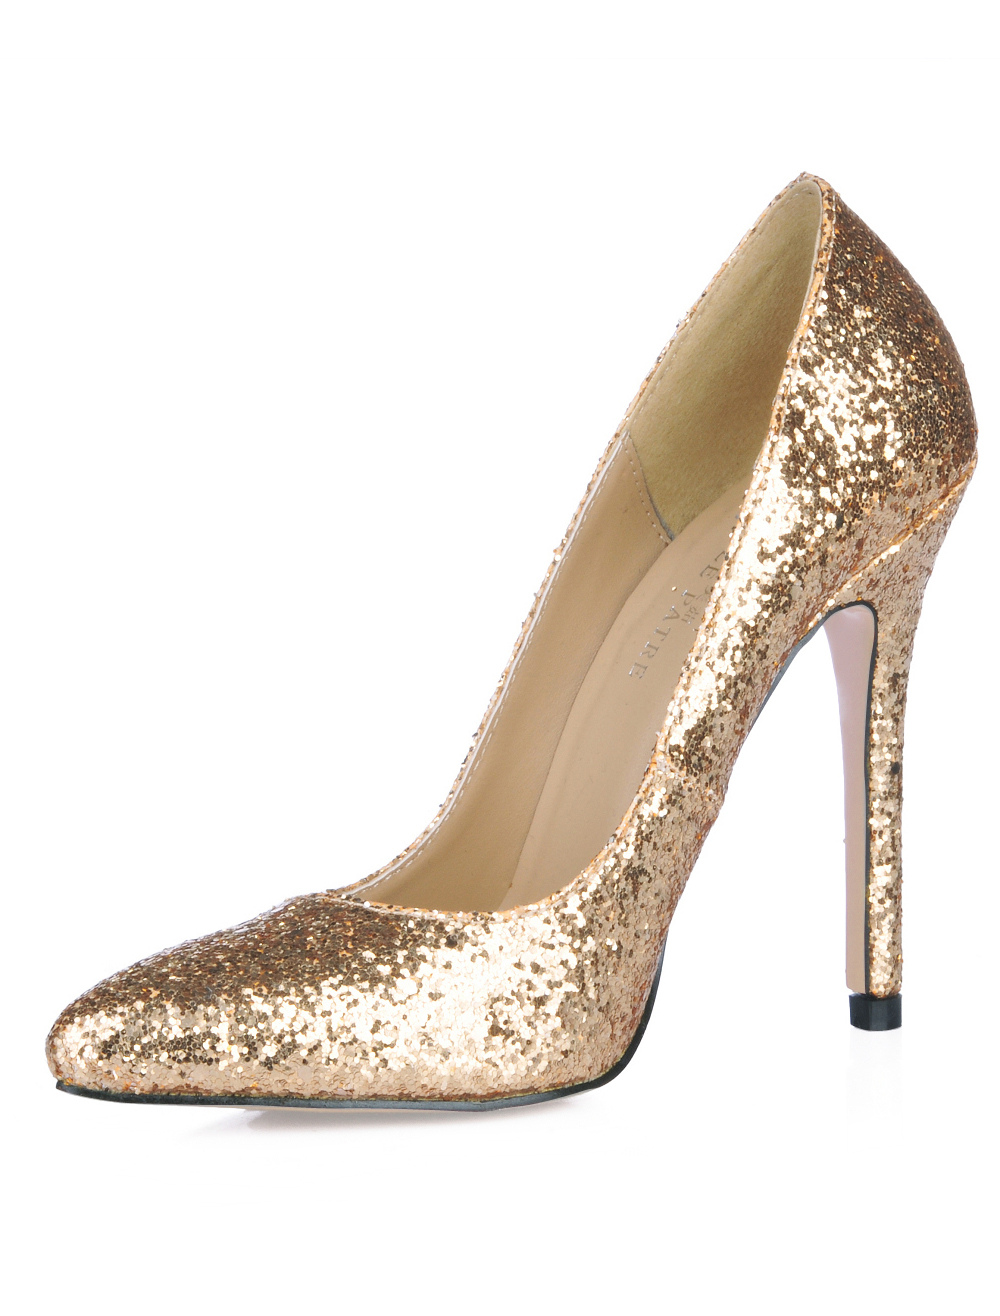 Golden Pointed Toe Stiletto Sequin PU Womens Shoes - Milanoo.com 8d0018c6b508